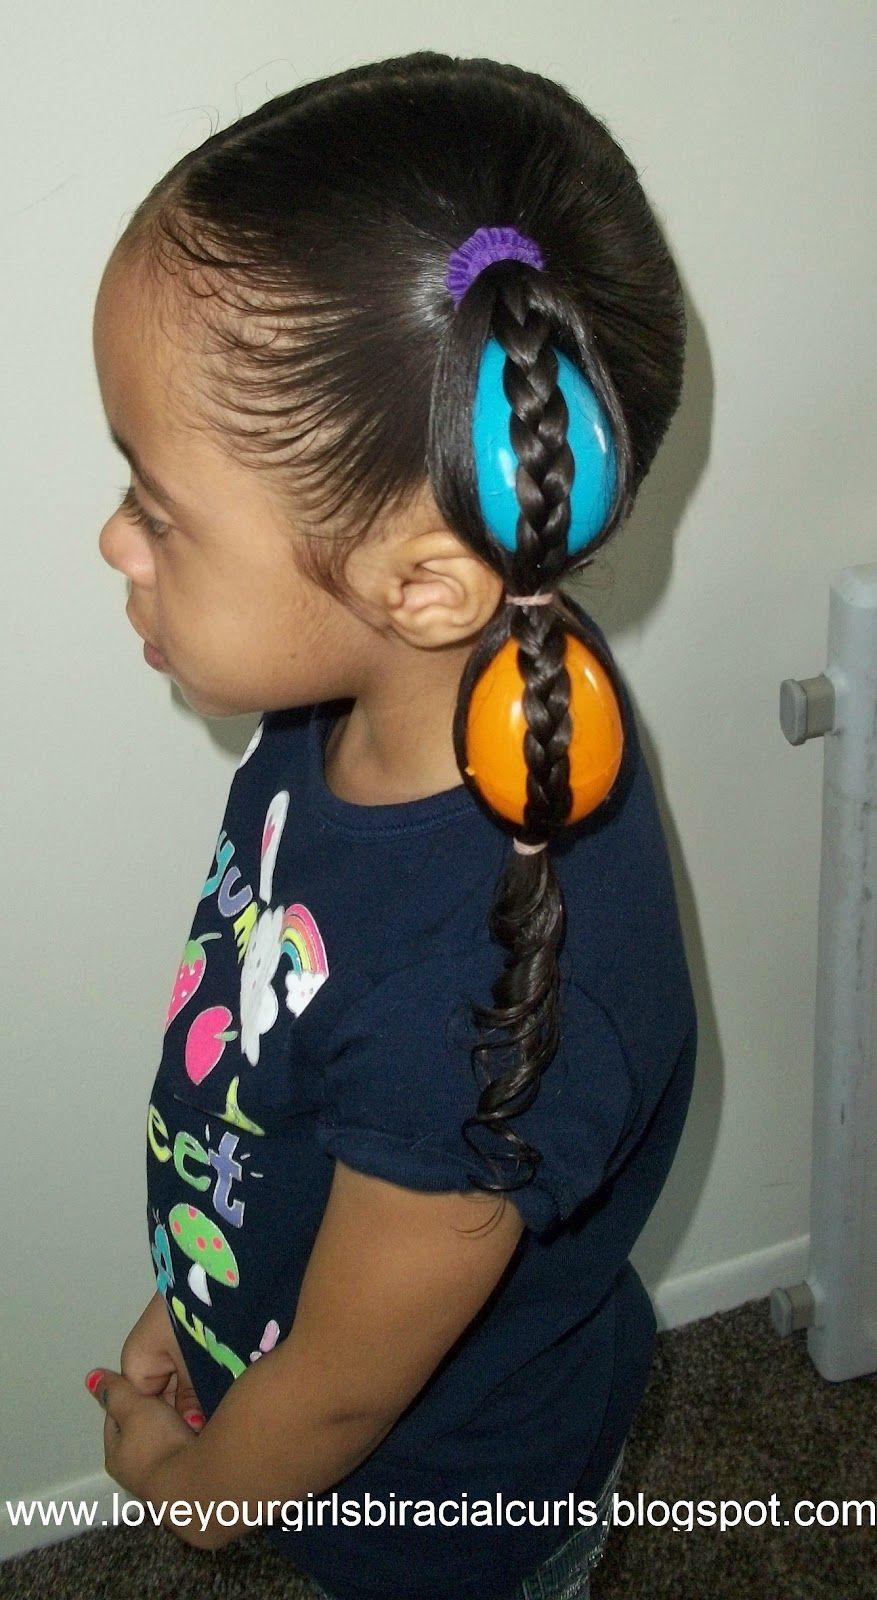 Admirable Mixed Girl Hairstyles Mixed Girls And Girl Hairstyles On Pinterest Short Hairstyles For Black Women Fulllsitofus